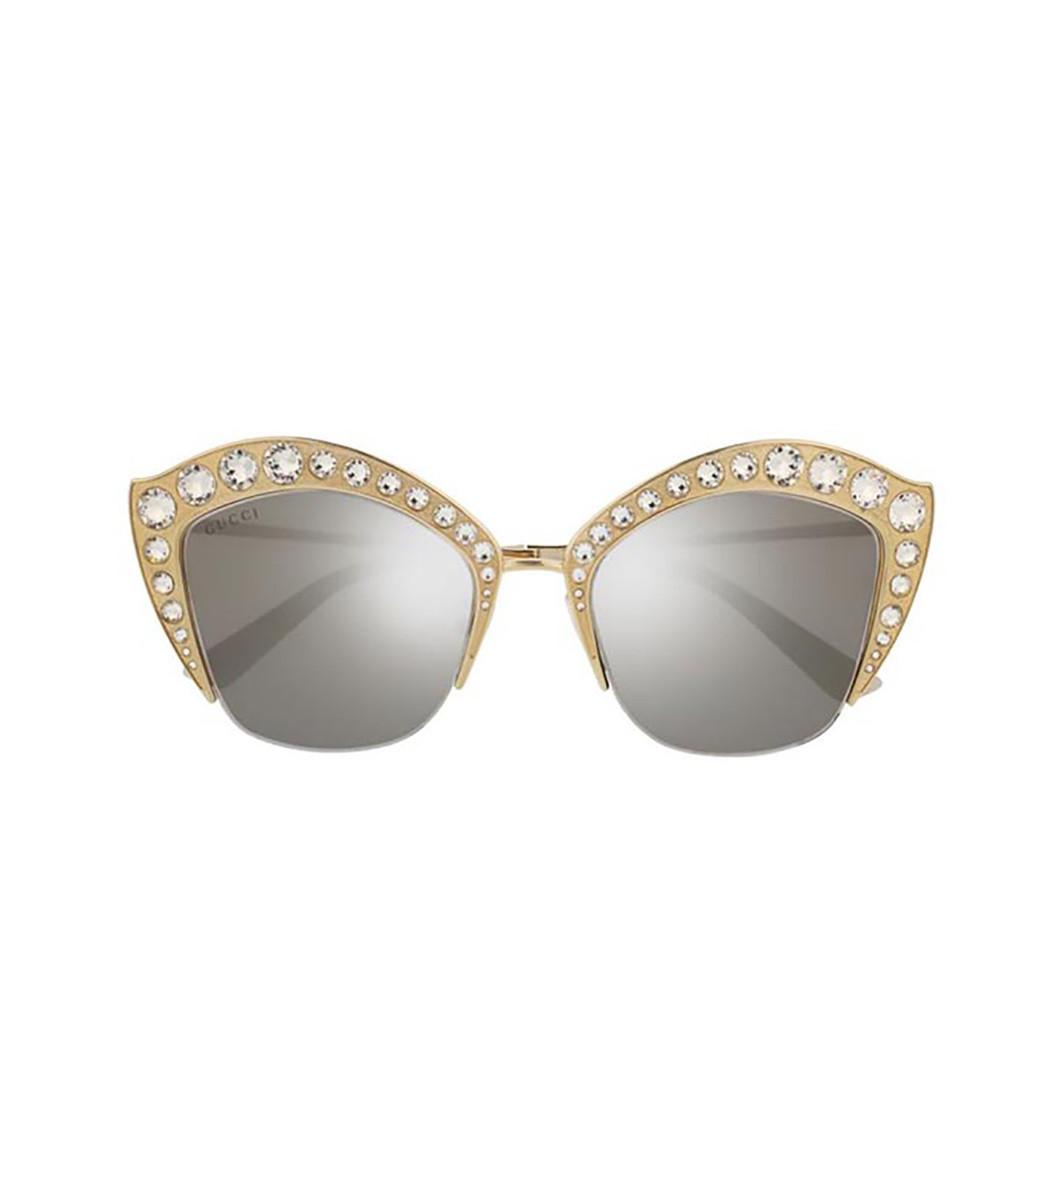 b69d8c71f33 Gucci Cat Eye Swarovski Sunglasses - Gold Silver Metal Sunglasses